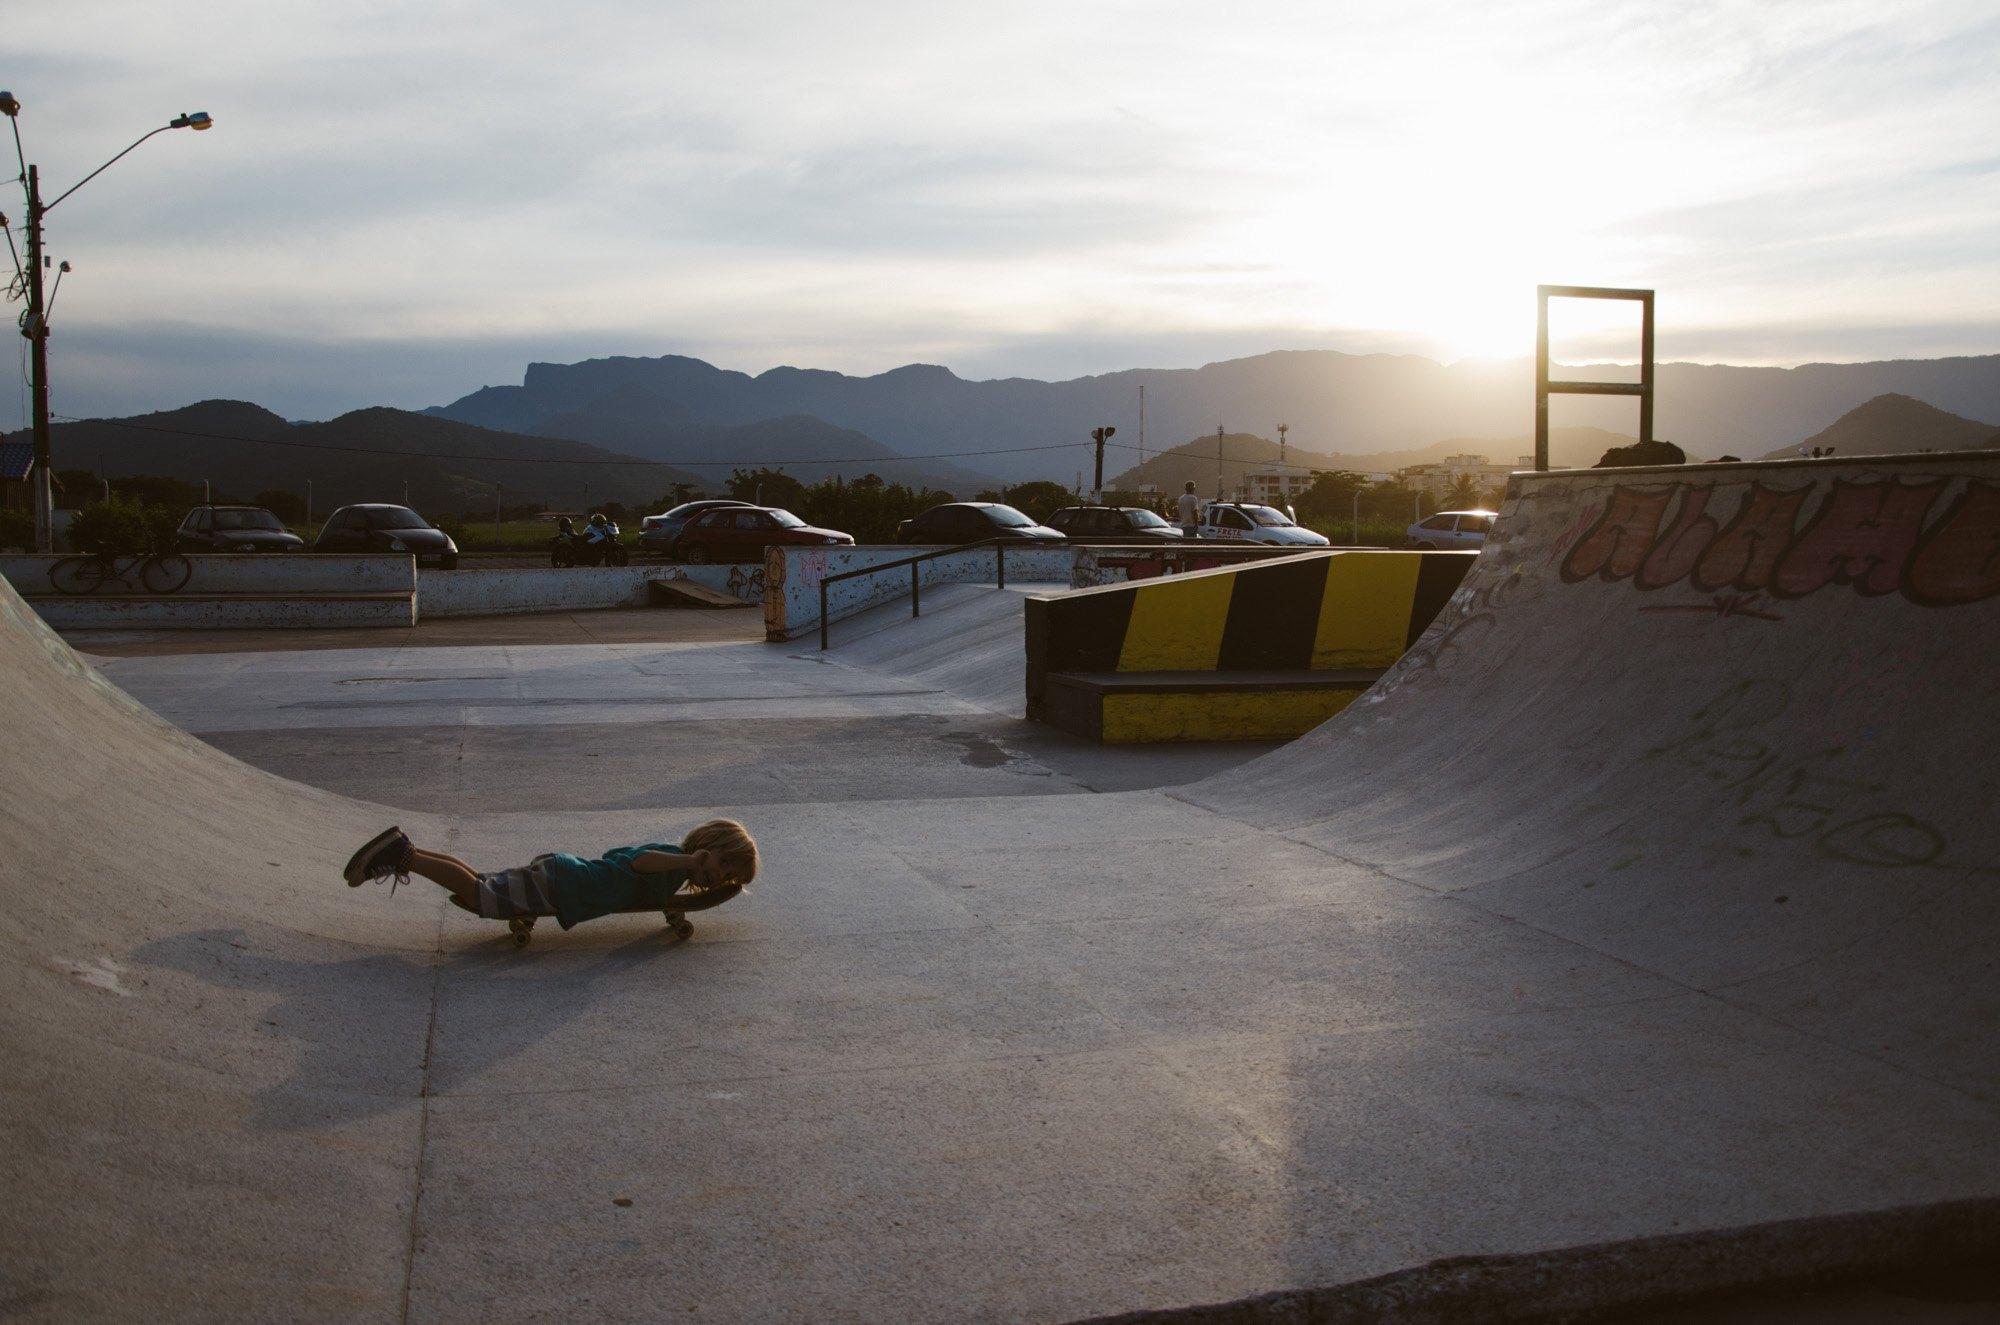 pista-skate-itagua-ubatuba-daniela-seco-37